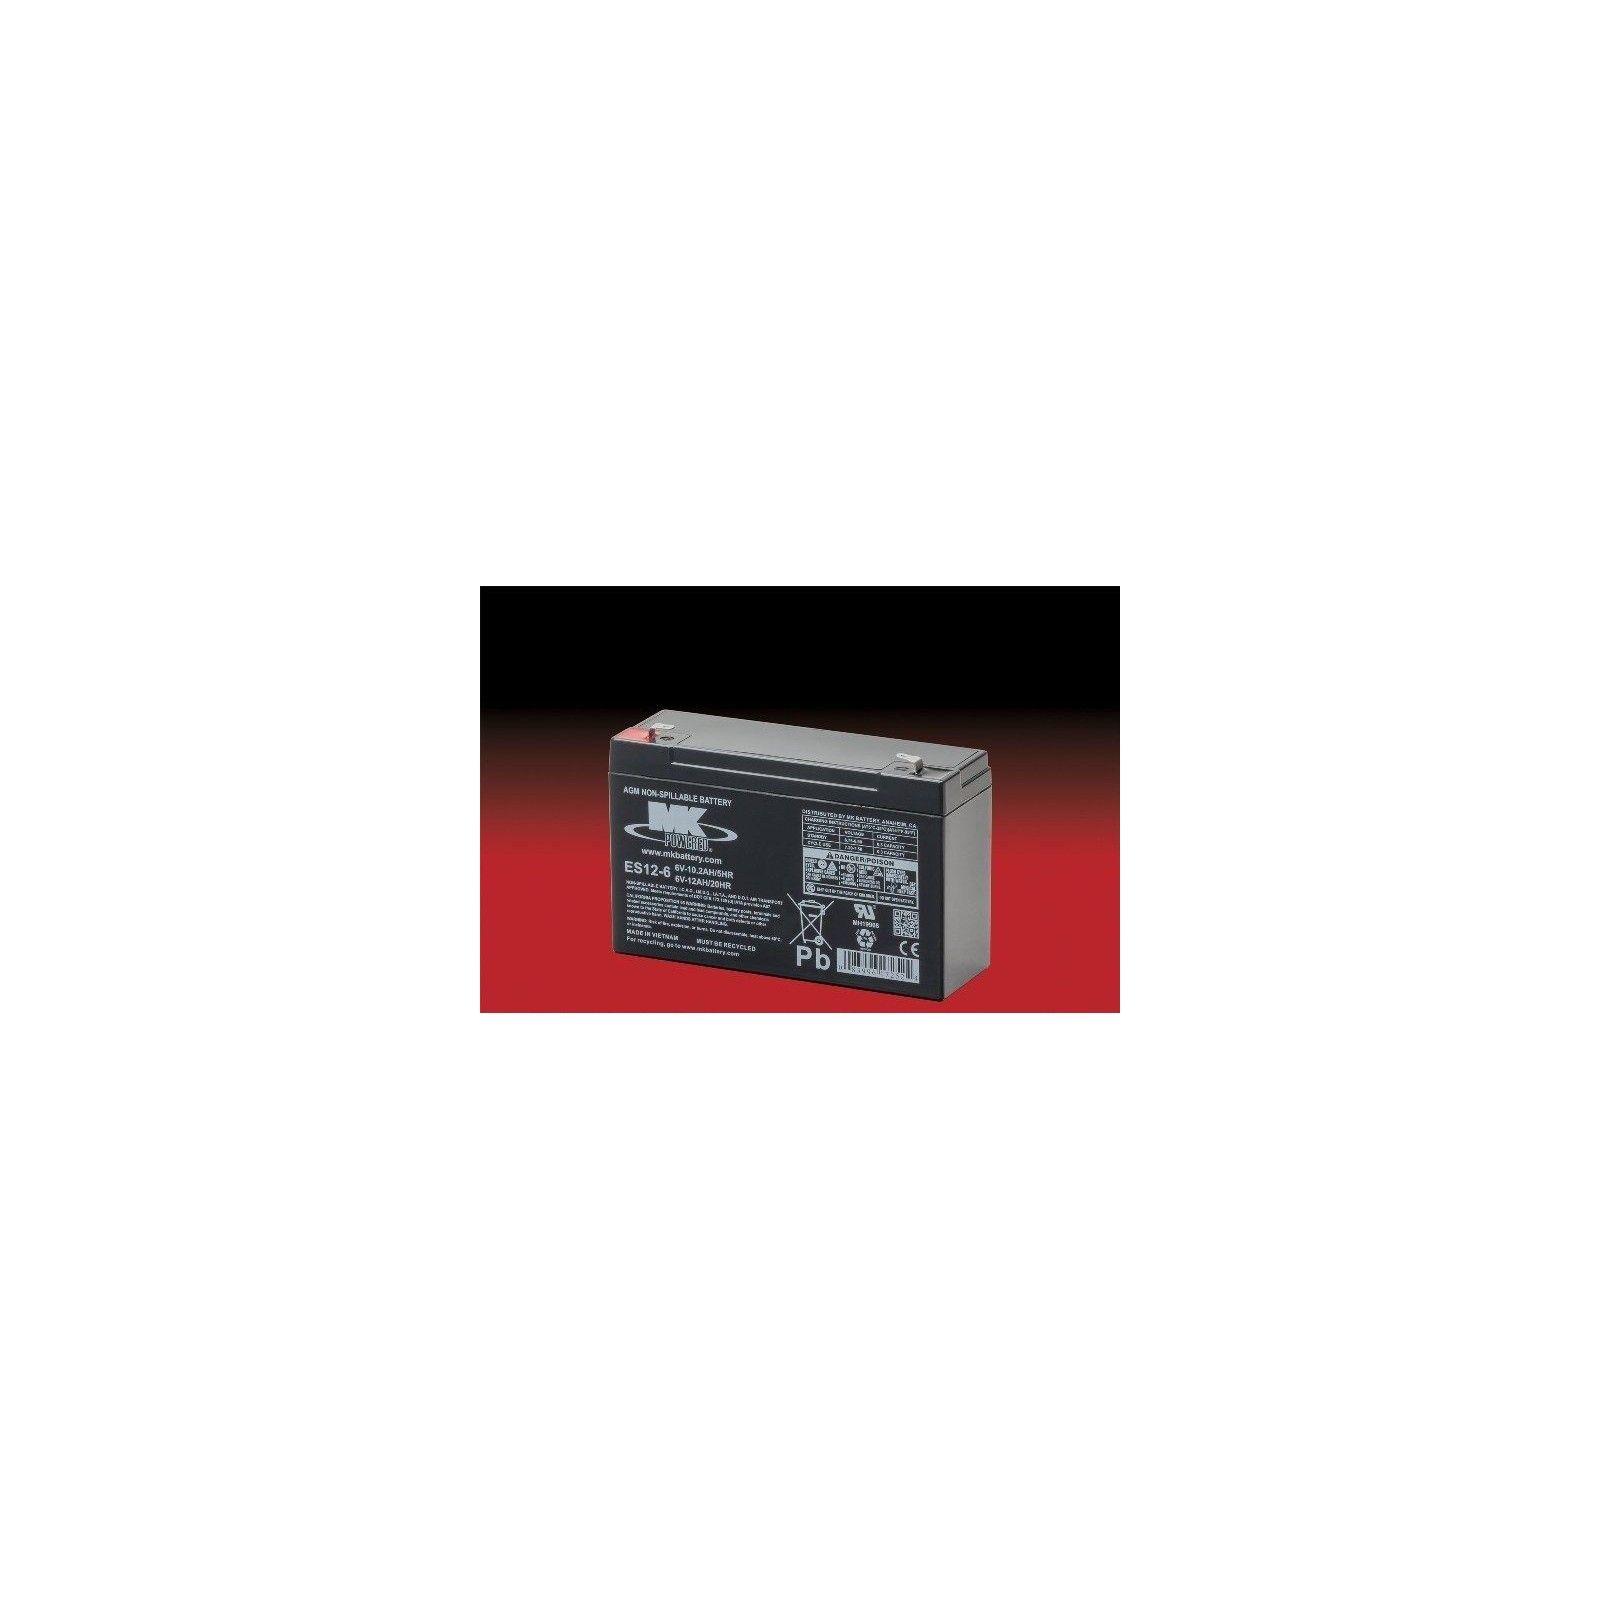 Batería MK ES12-6 12Ah 6V Agm MK - 1